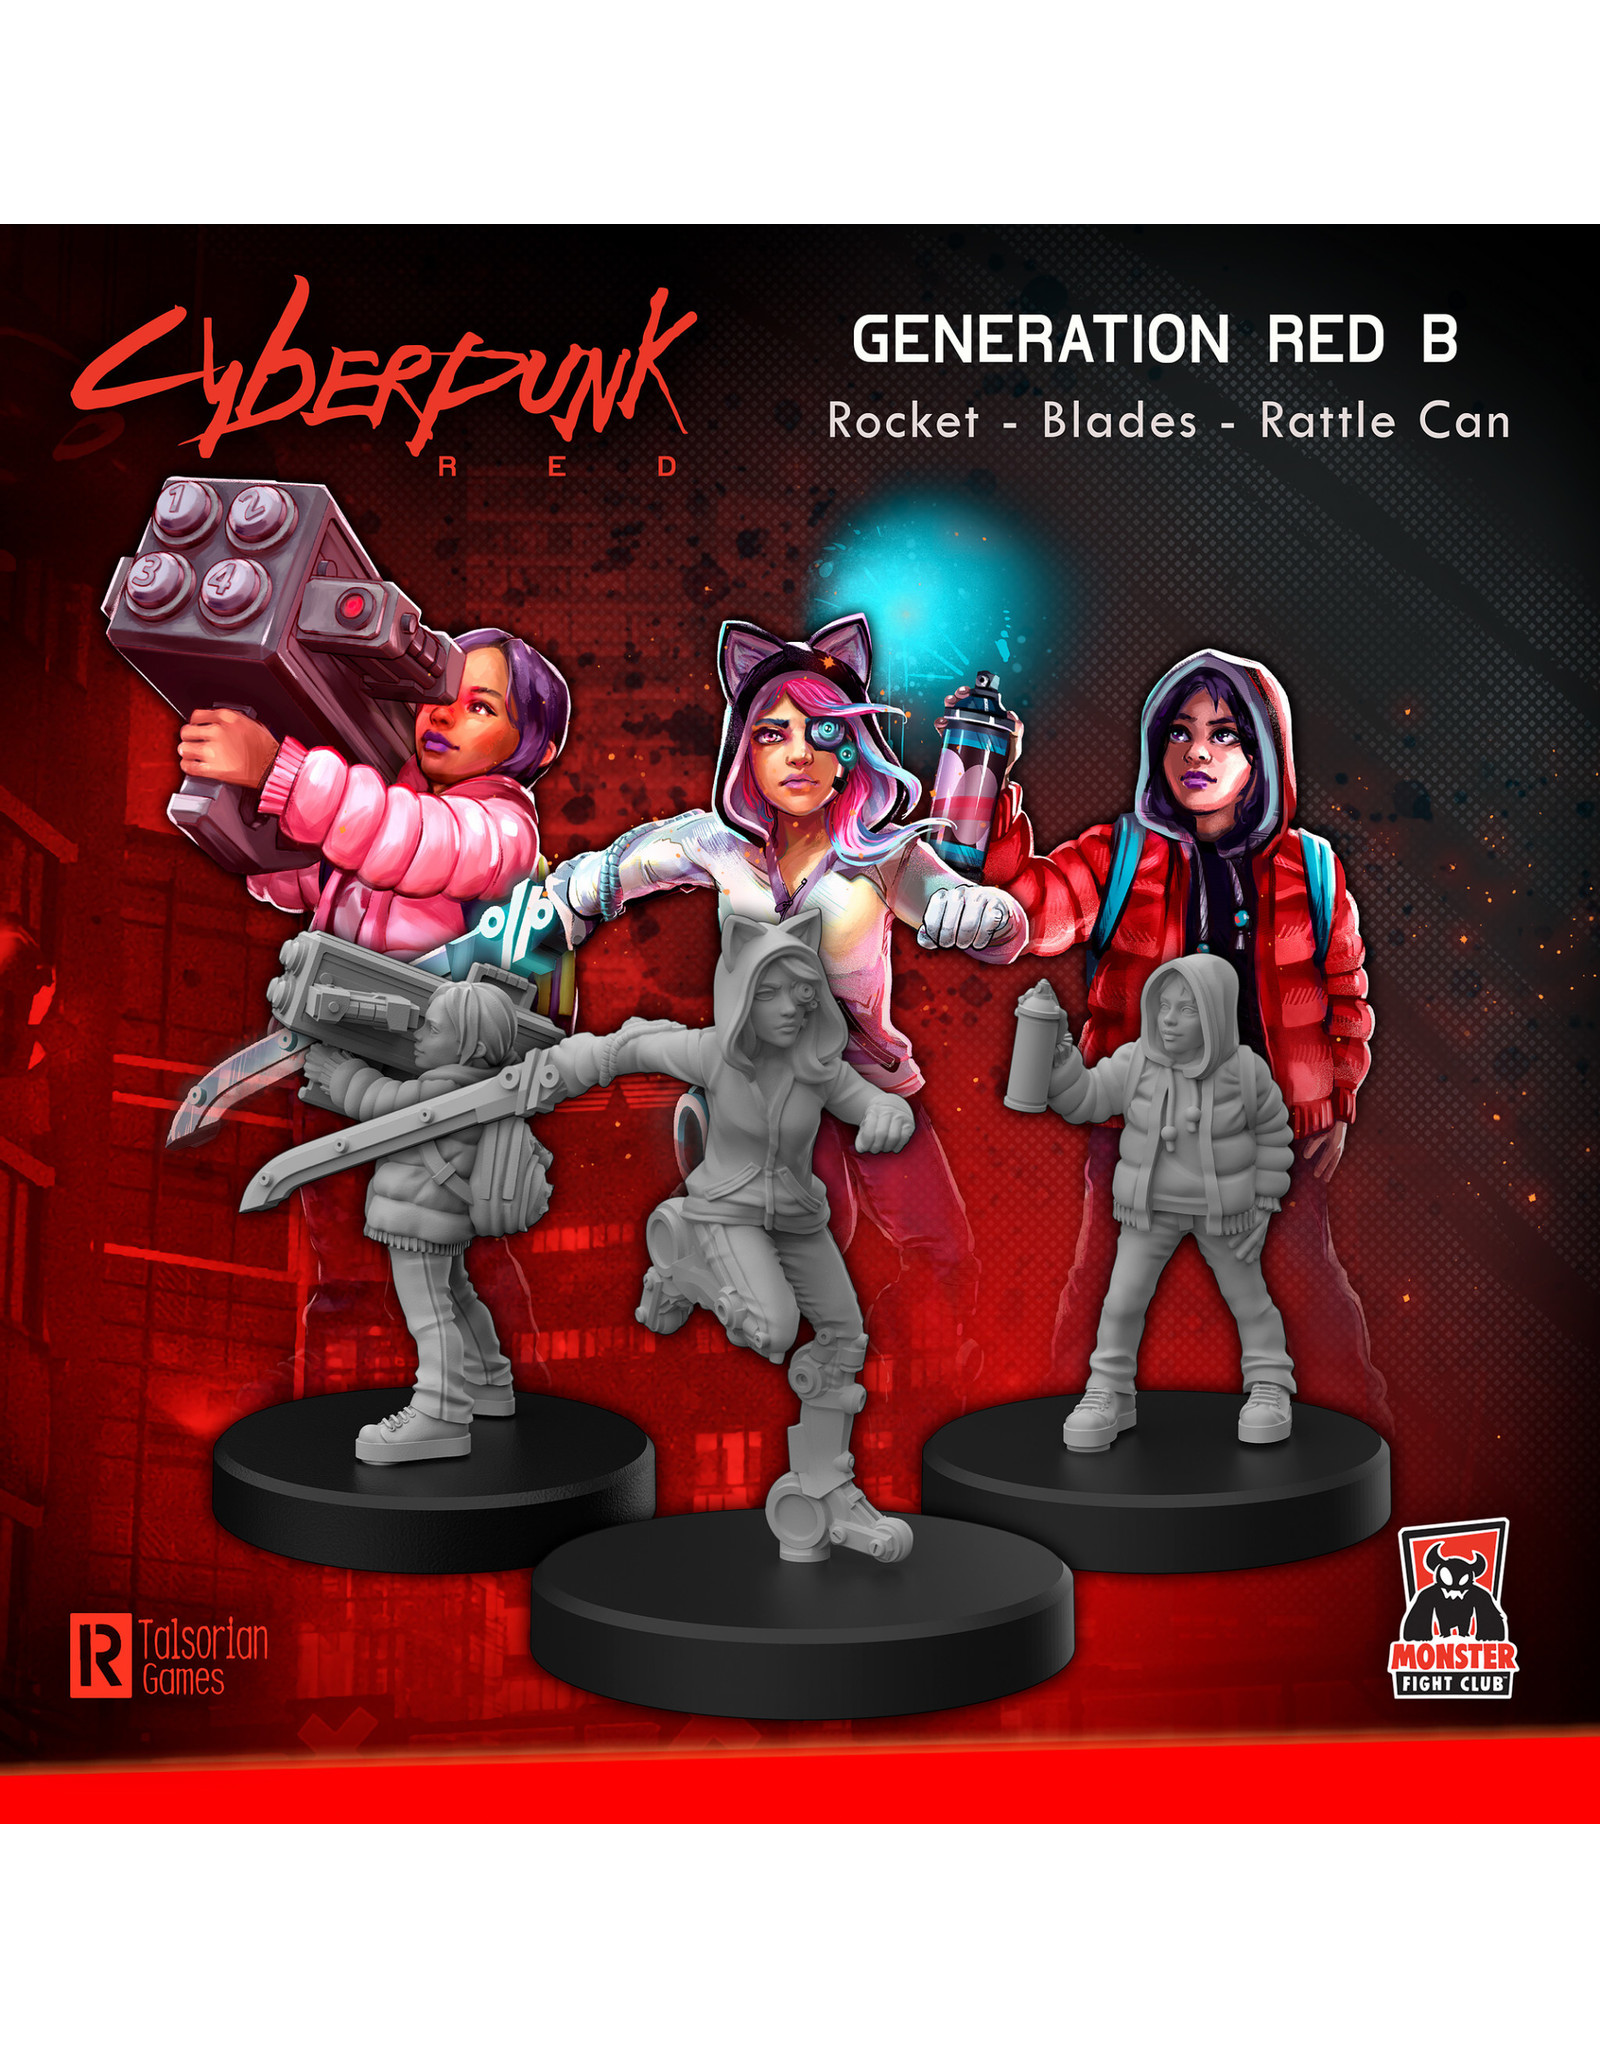 Monster Fight Club Cyberpunk Generation Red B